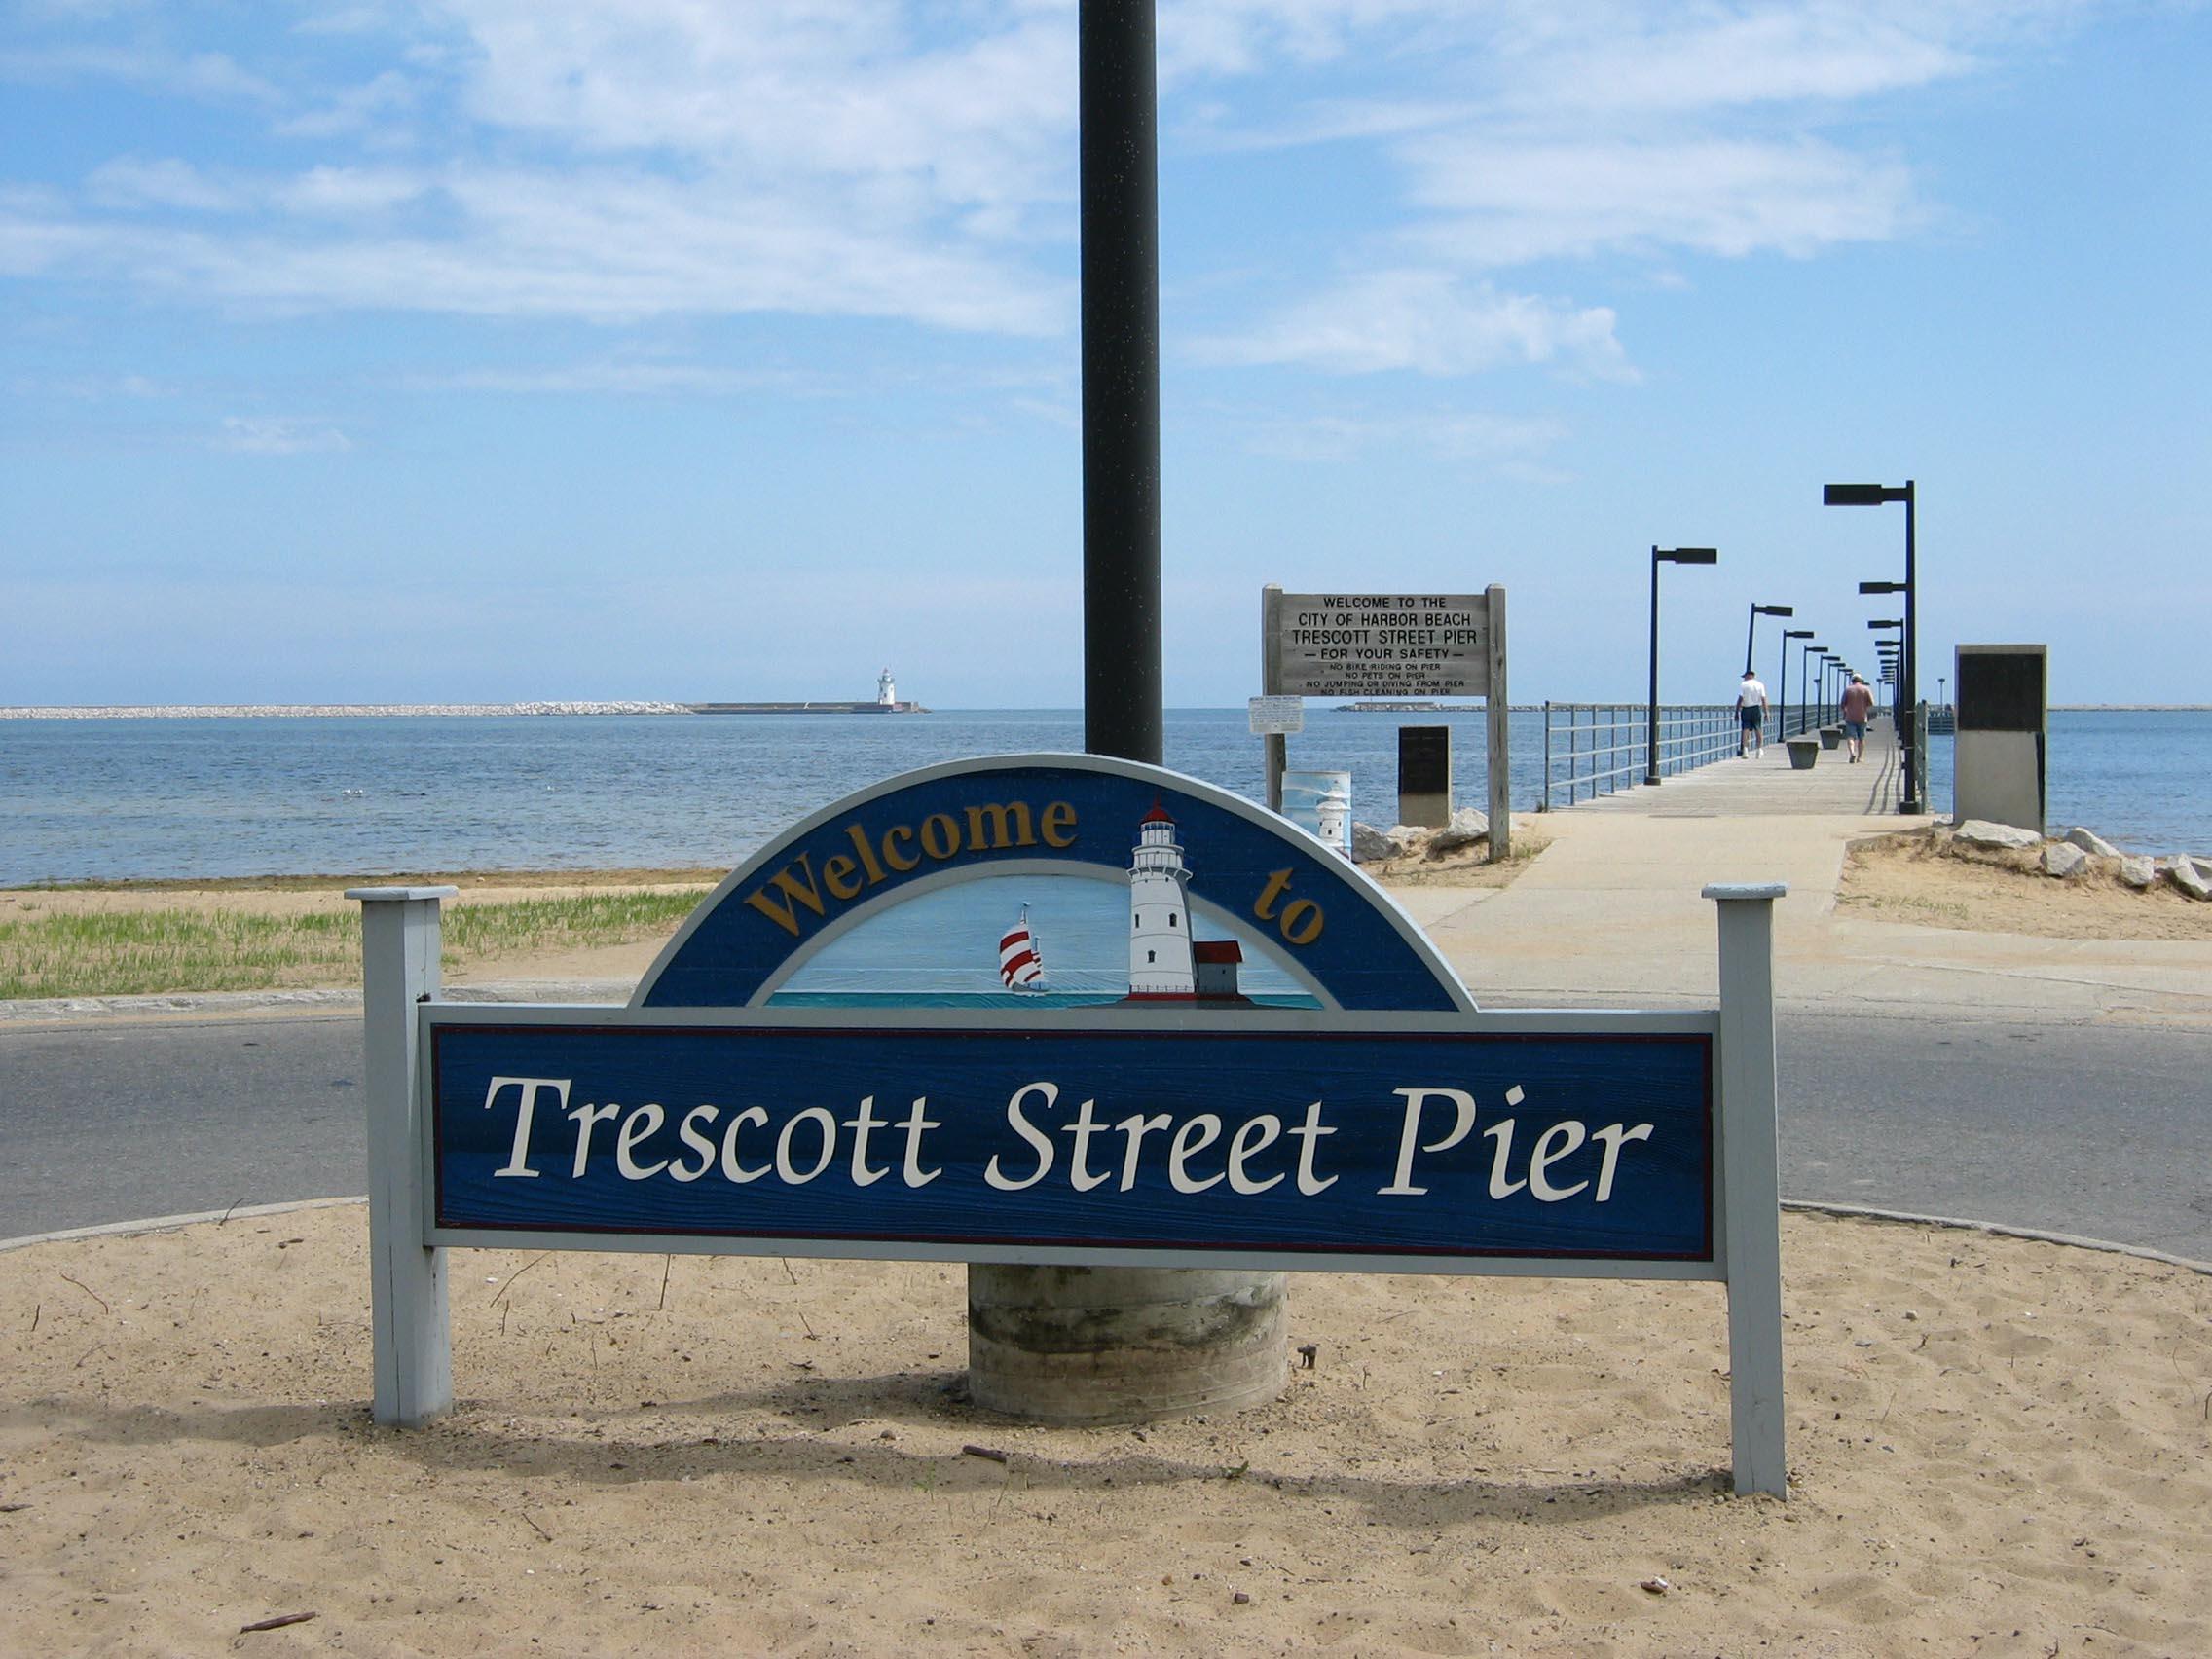 trescott street pier.jpg